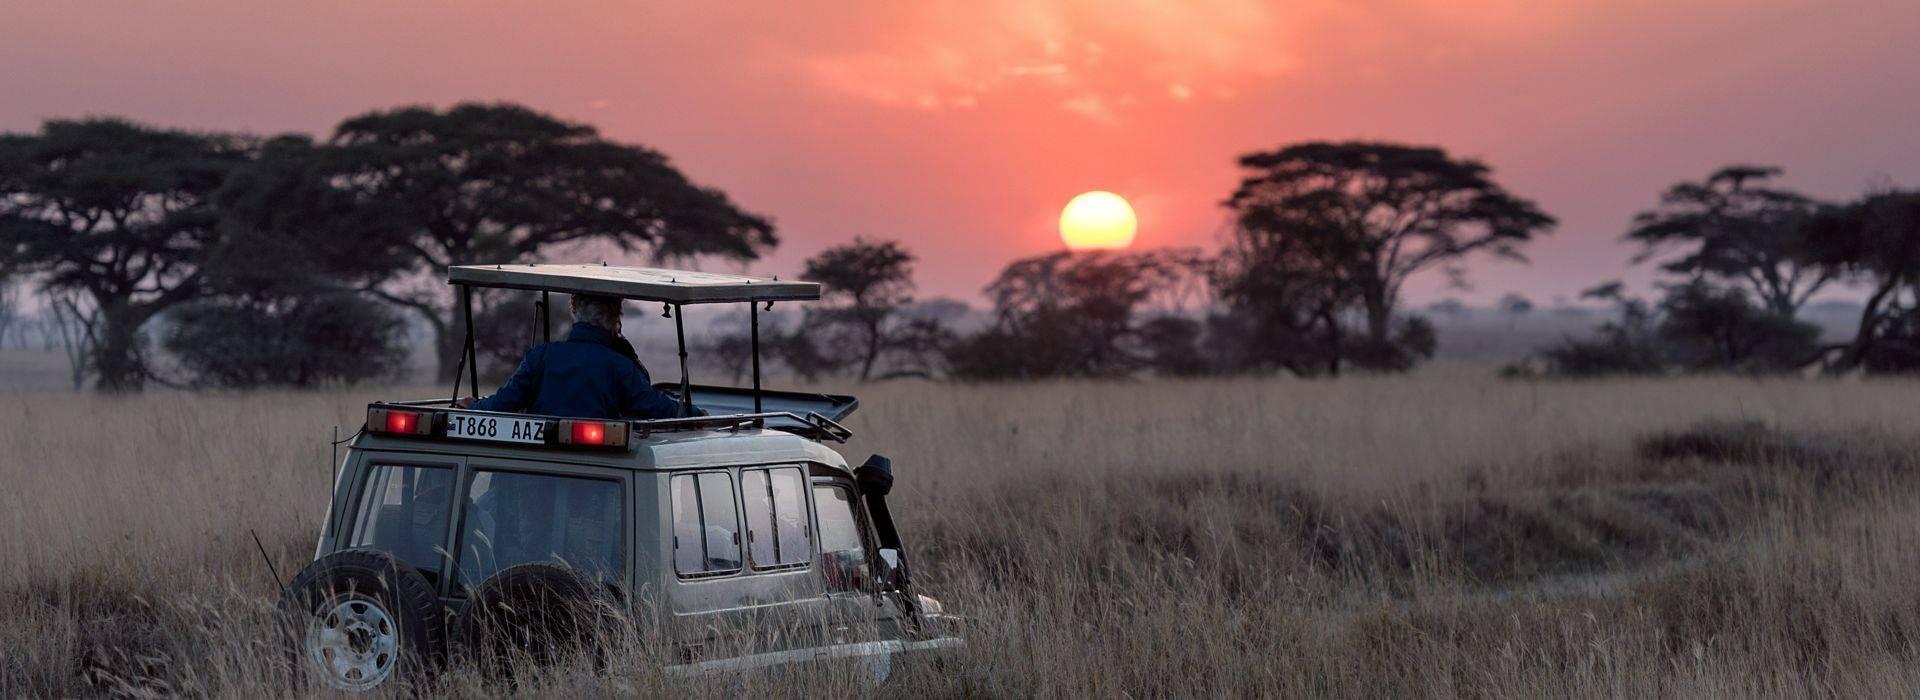 Africa Wellness Vacations